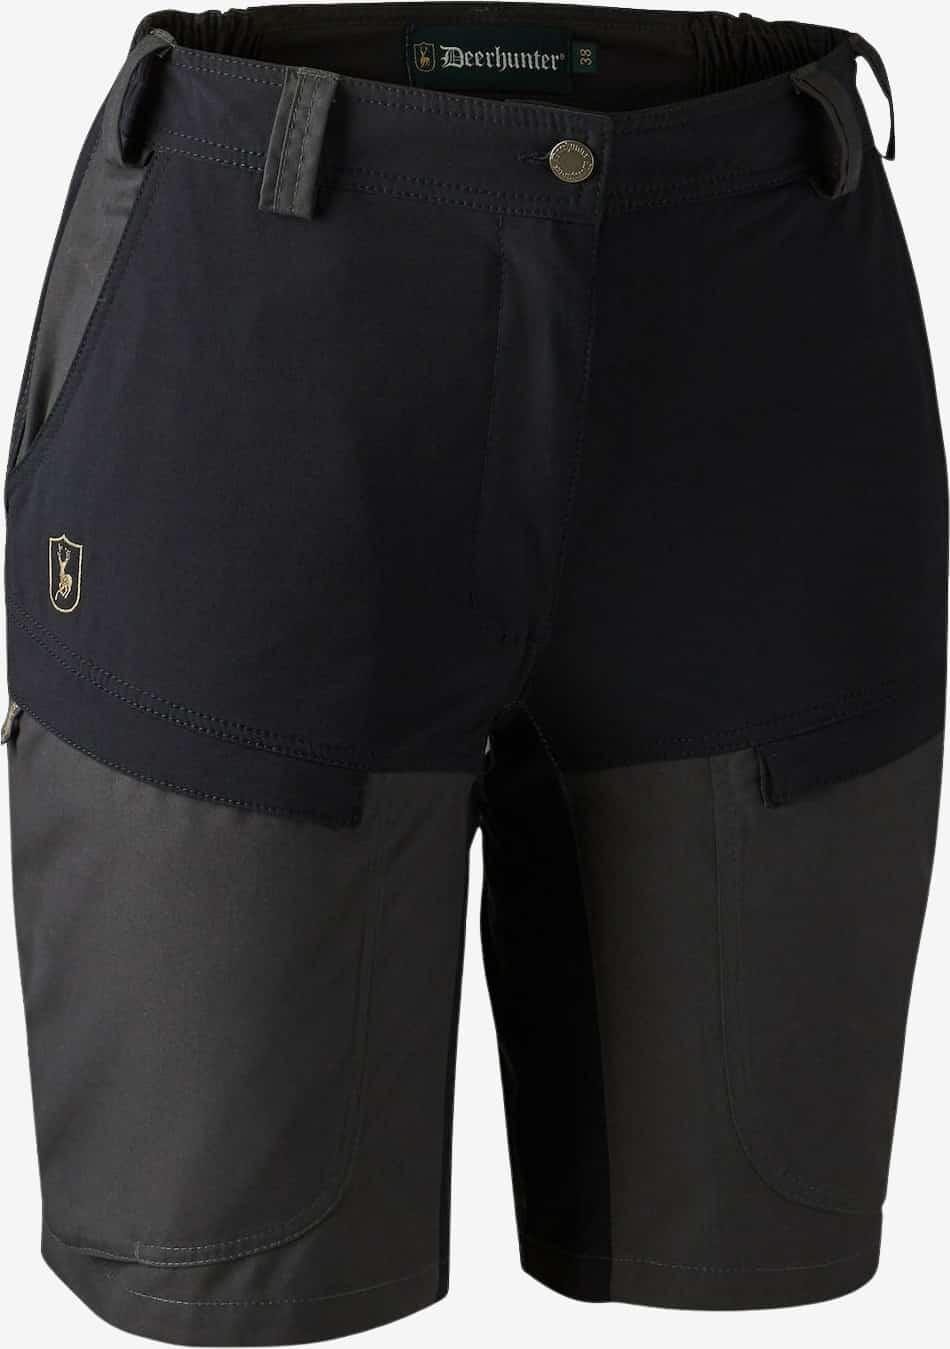 Deerhunter Lady Ann shorts-985